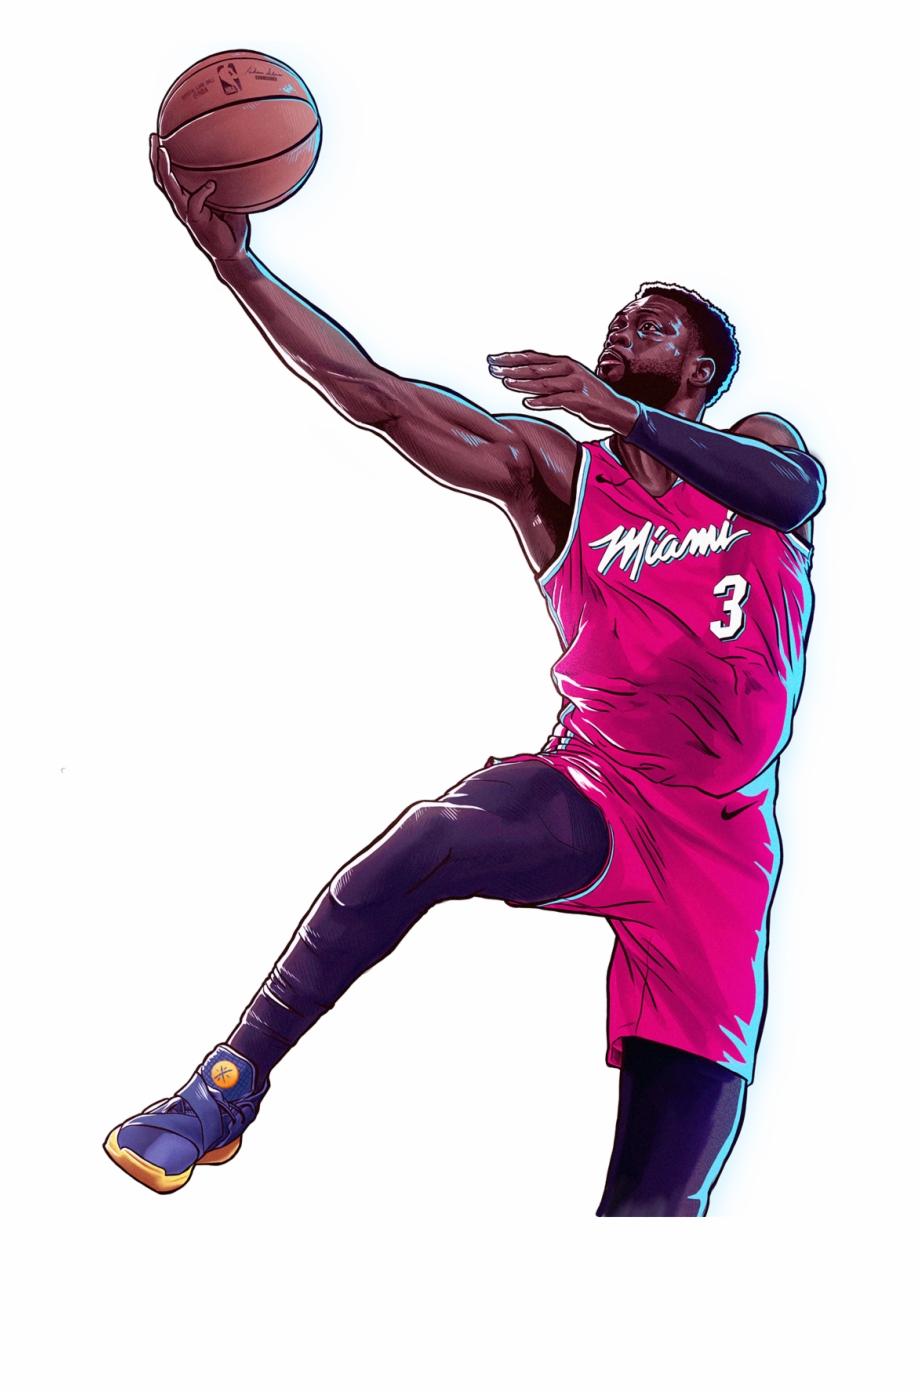 Dwyane wade clipart clipart royalty free stock Nba Dwyane Wade Bday Illustration - Slam Dunk Free PNG Images ... clipart royalty free stock